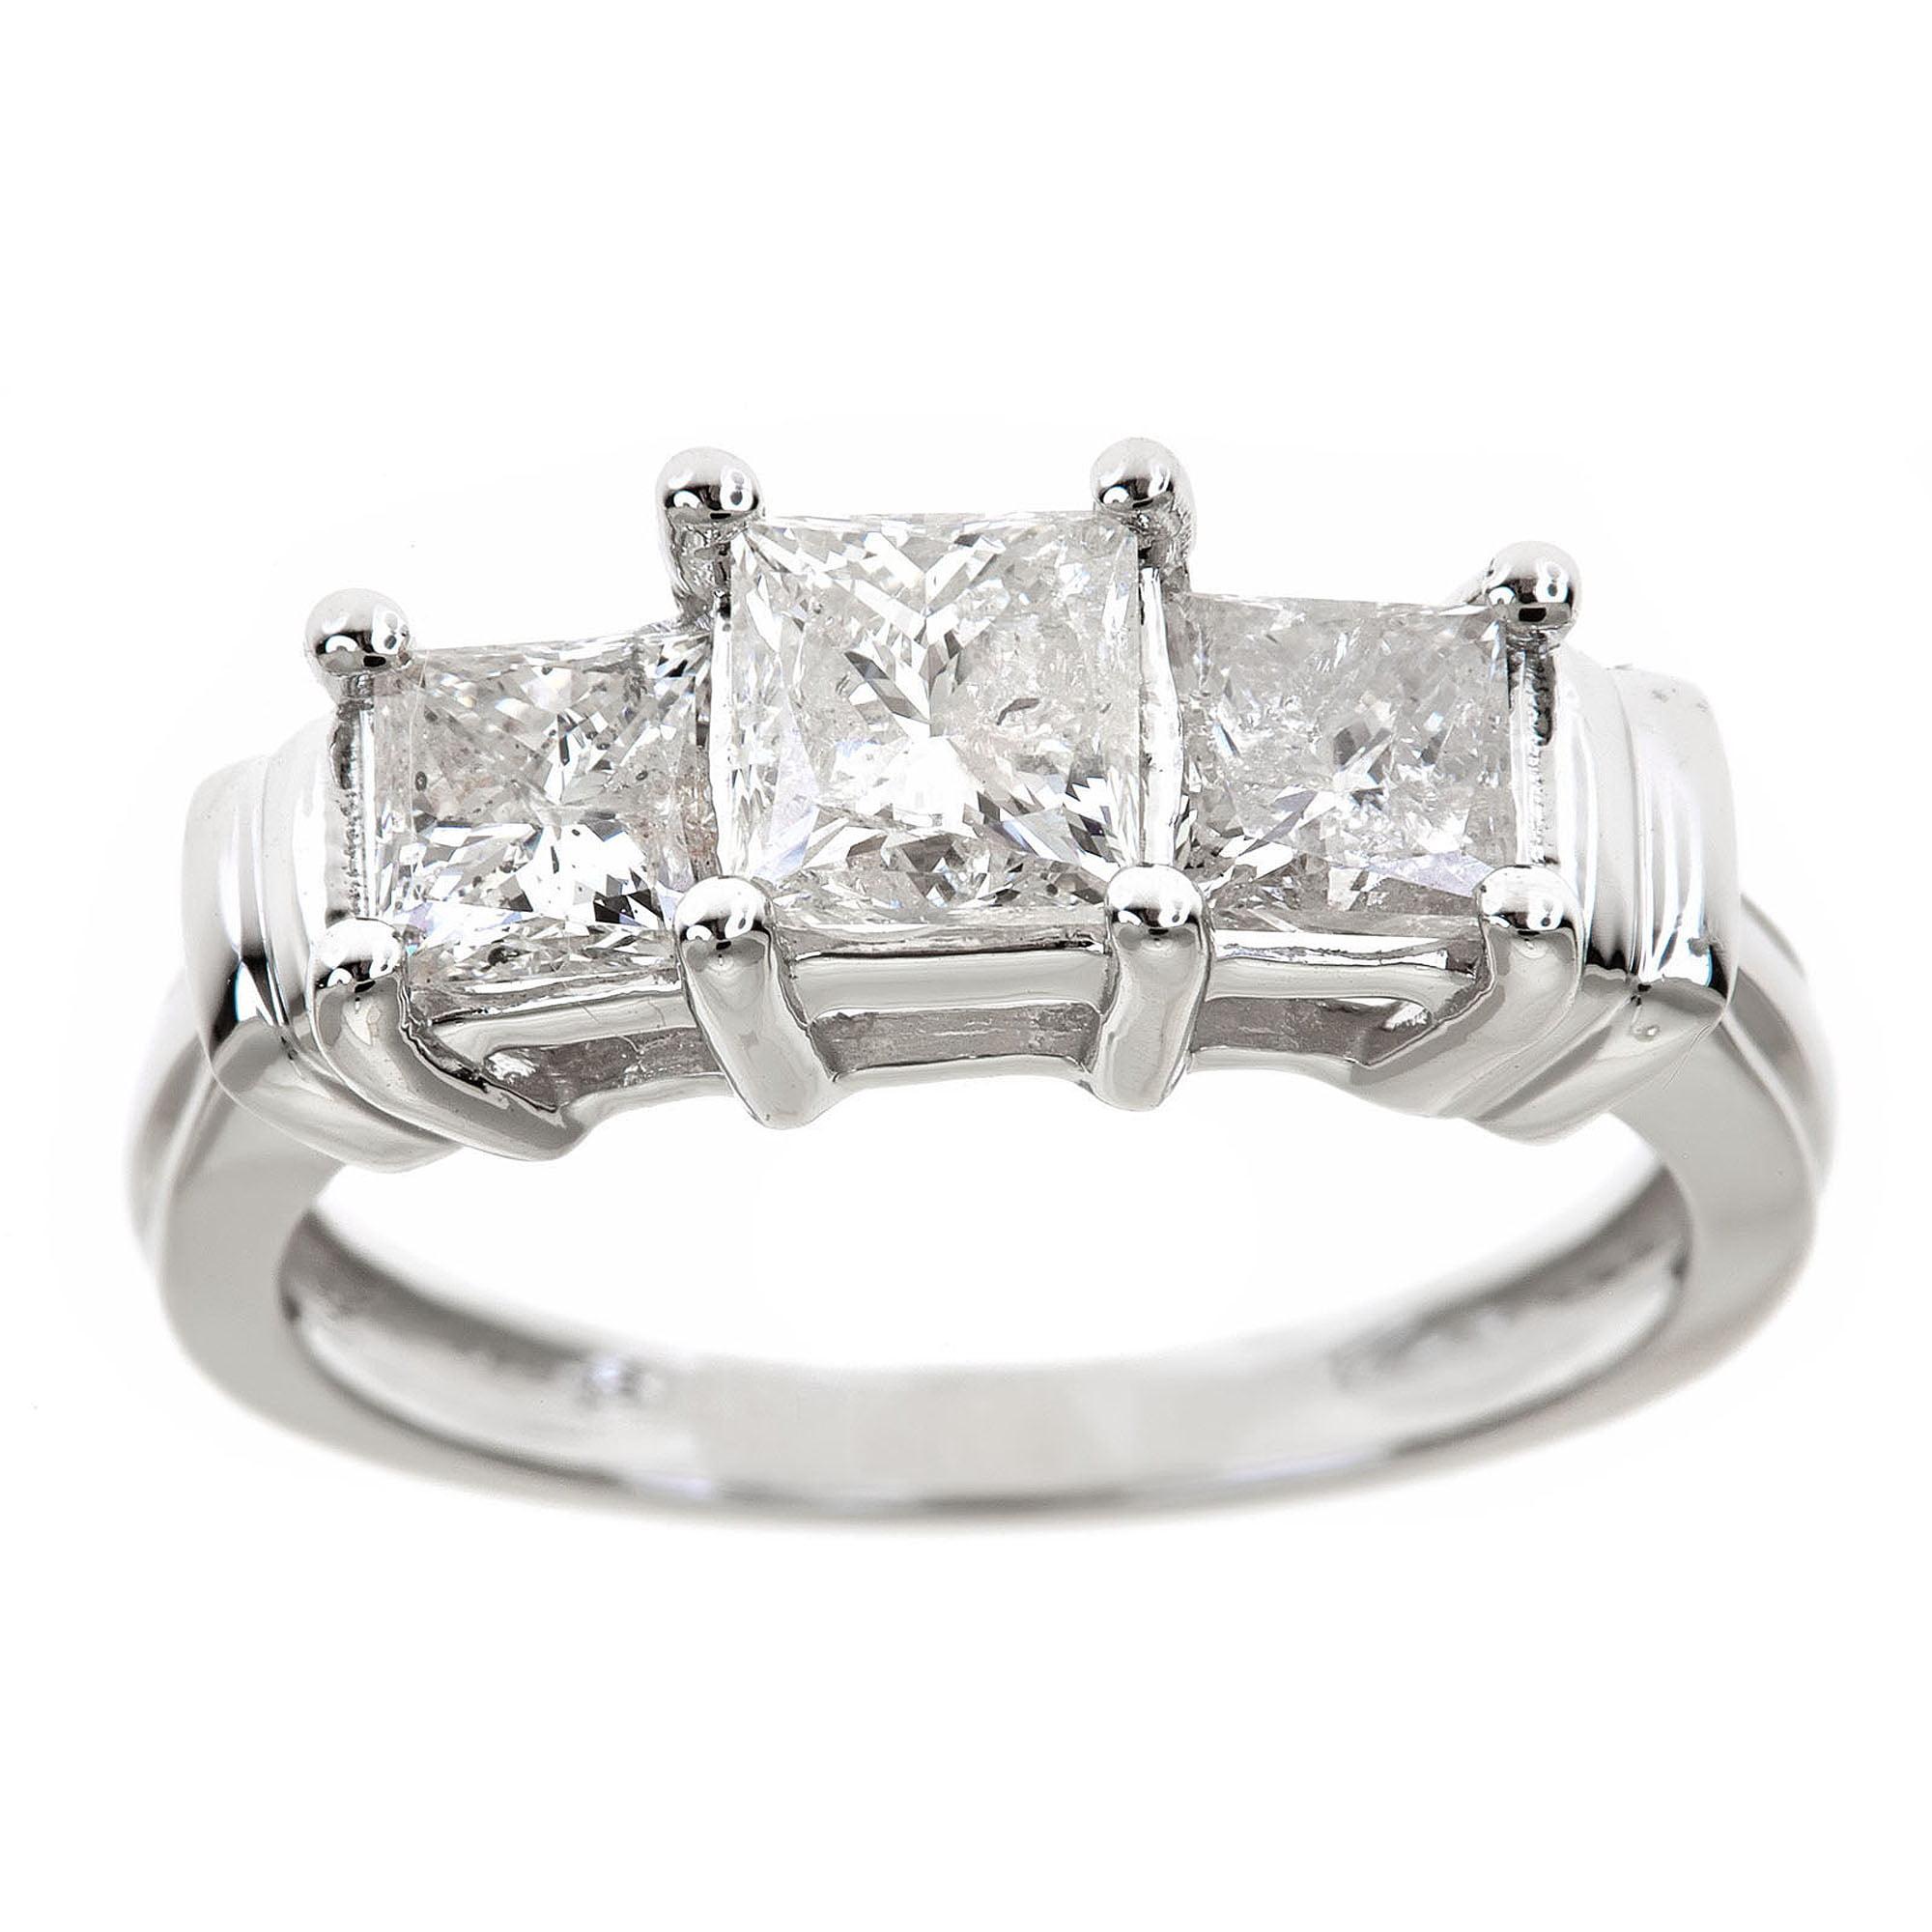 1-1/2 Carat T.W. Genuine Princess White Diamond 14kt White Gold 3 Stone Ring, IGL Certified